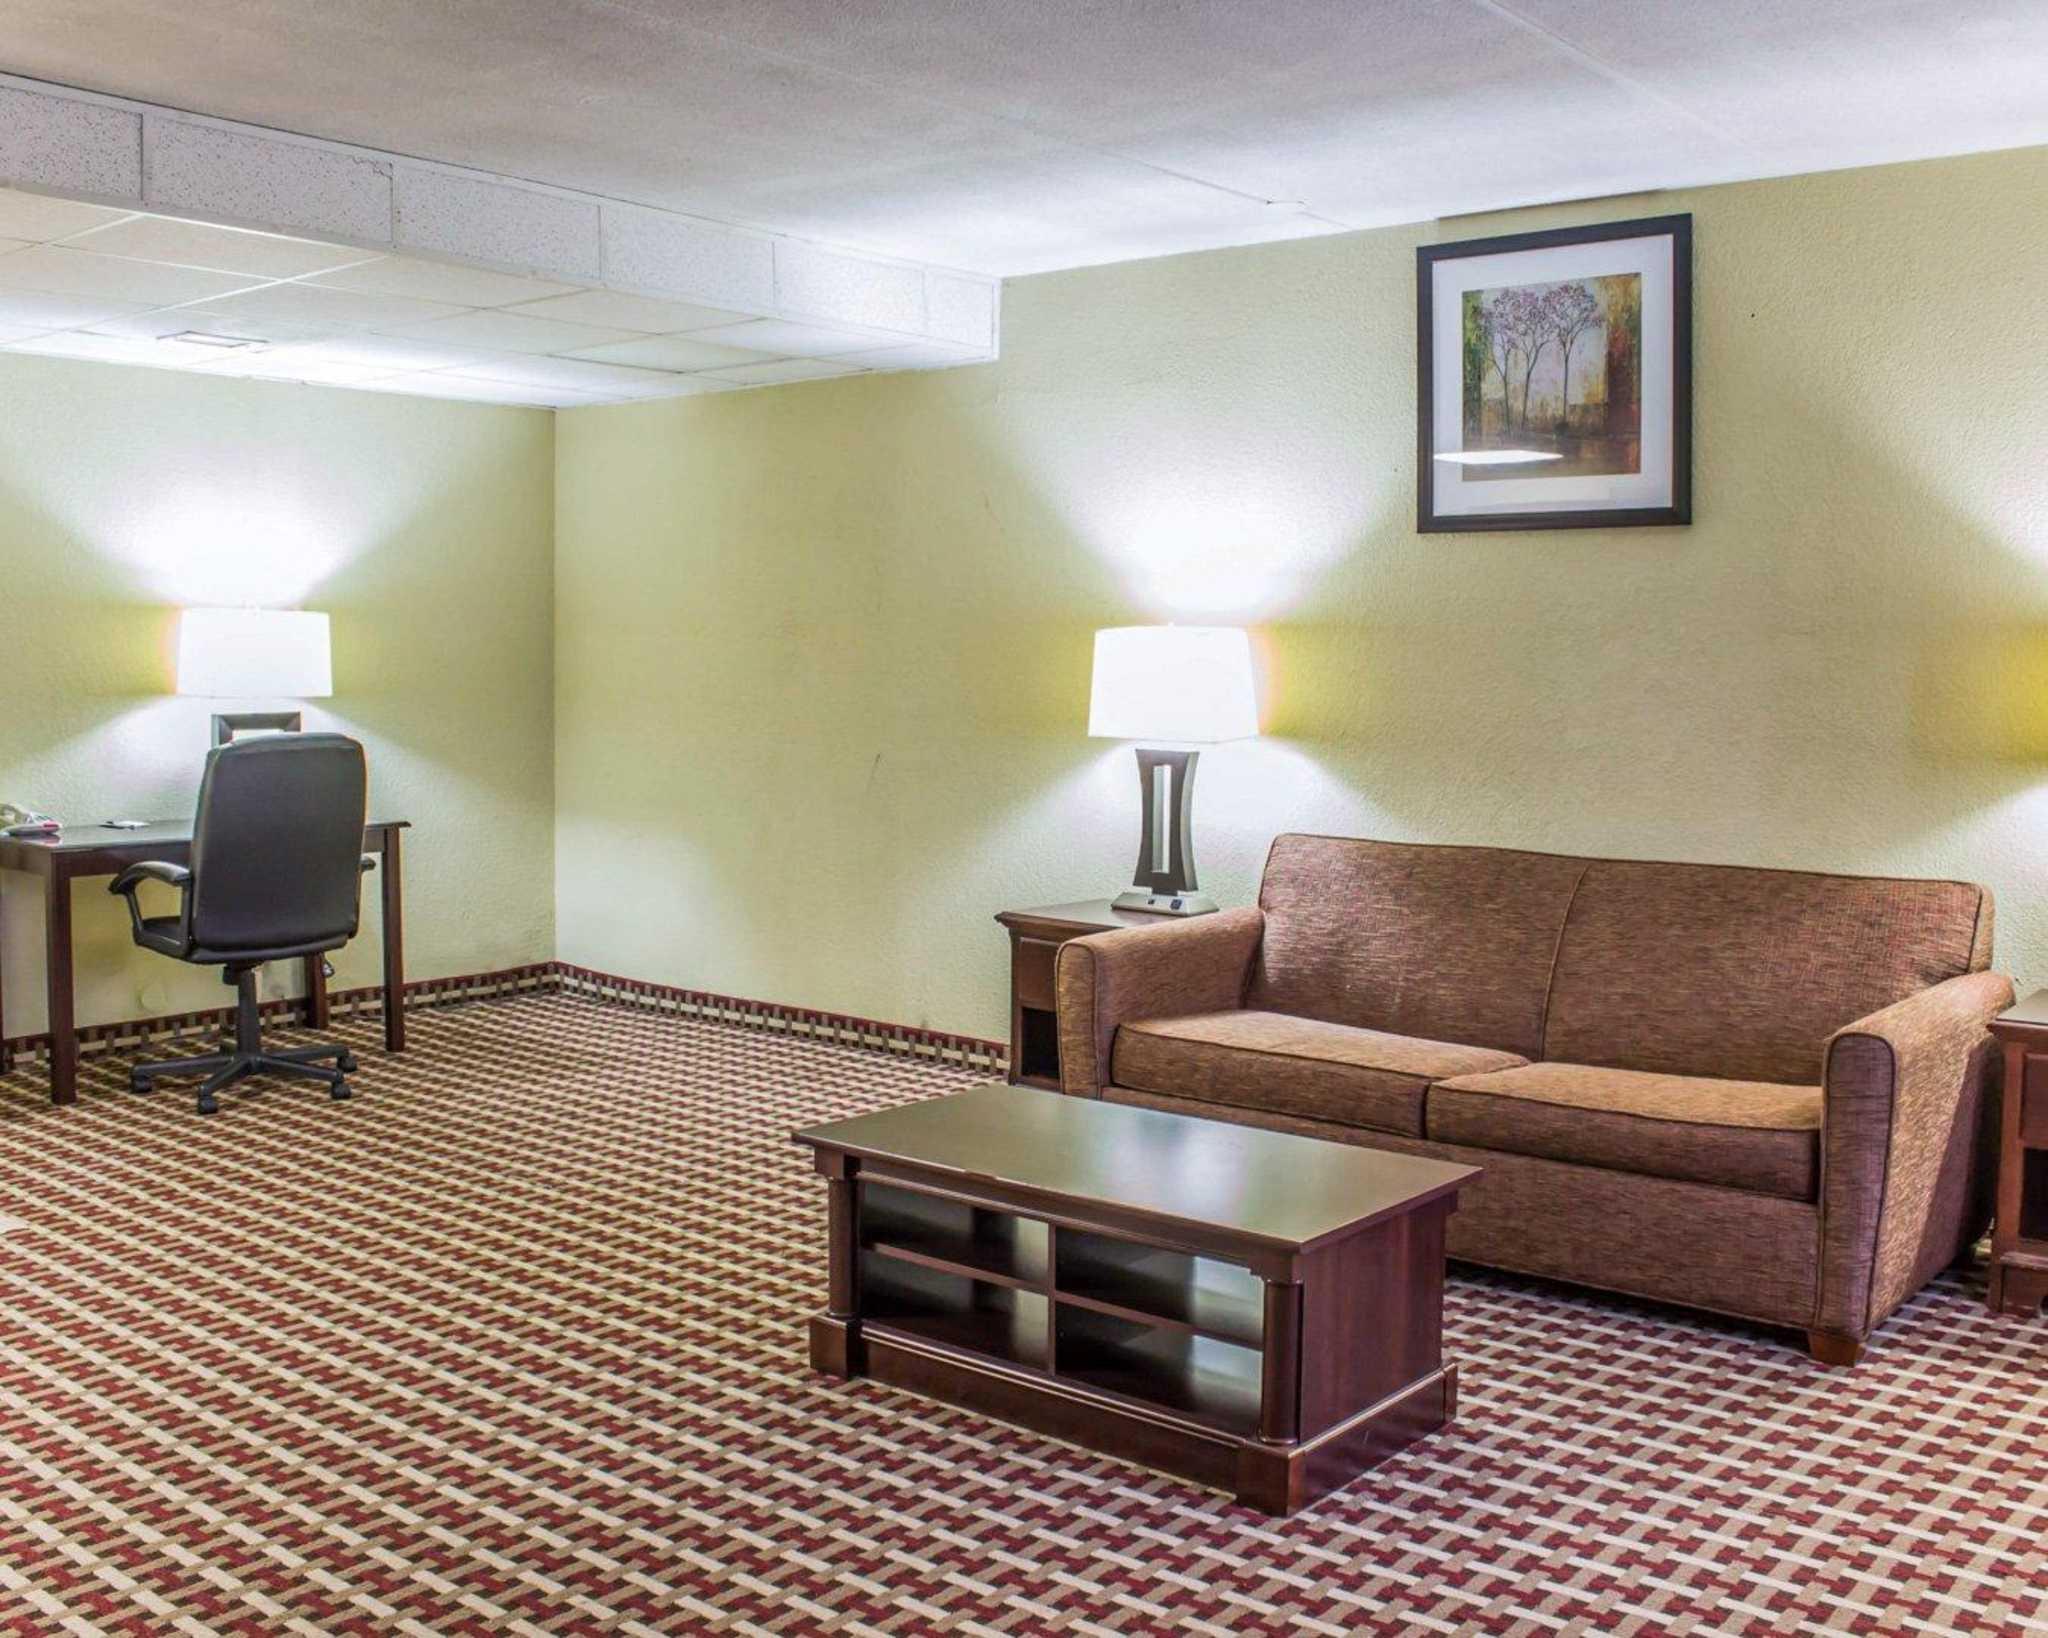 Quality Inn & Suites Fort Bragg image 22